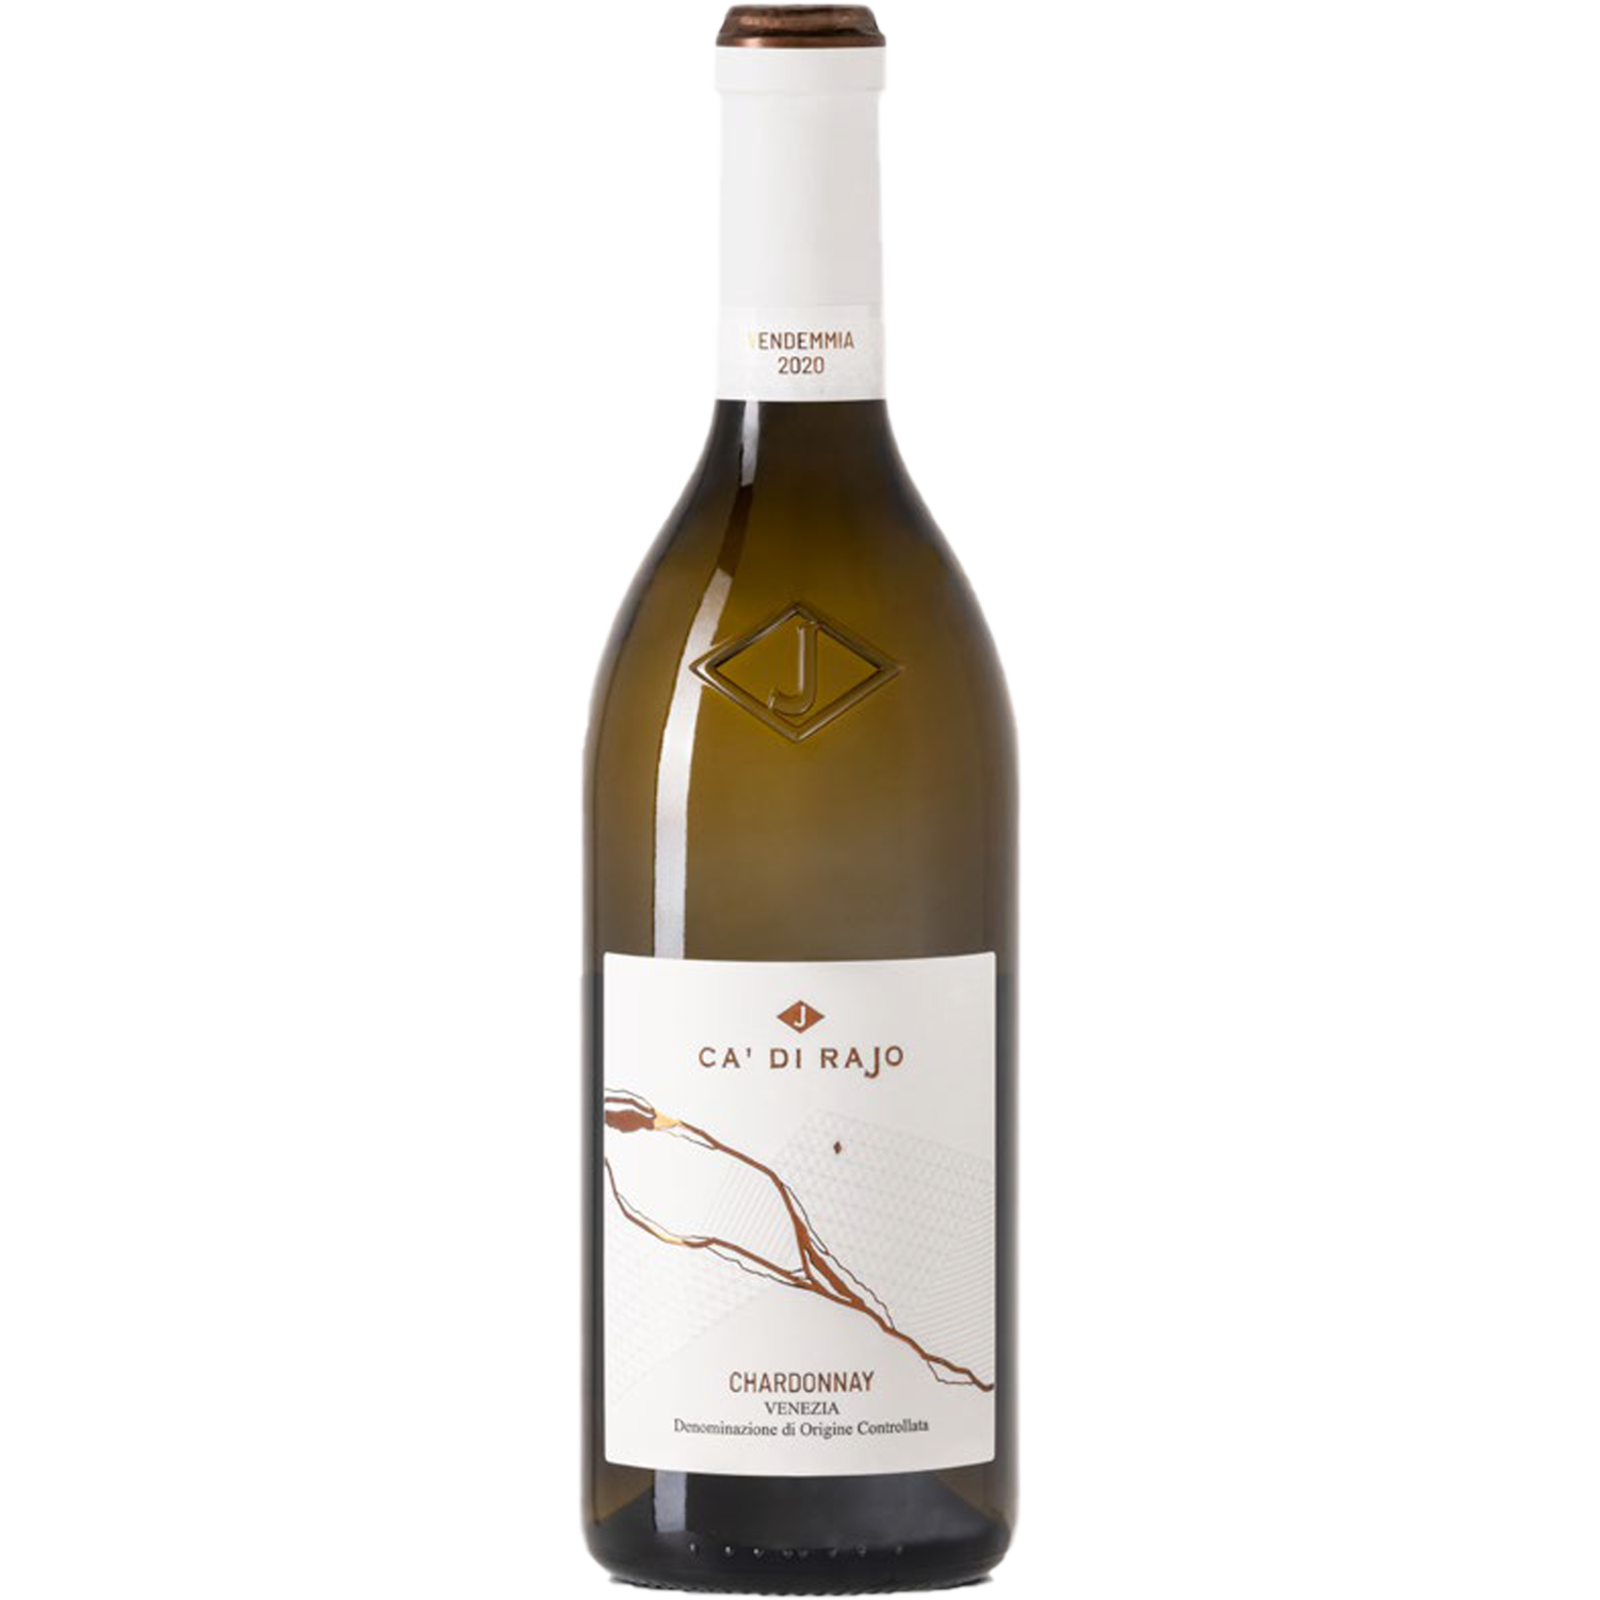 Ca' di Rajo Ca' di Rajo Chardonnay 2020